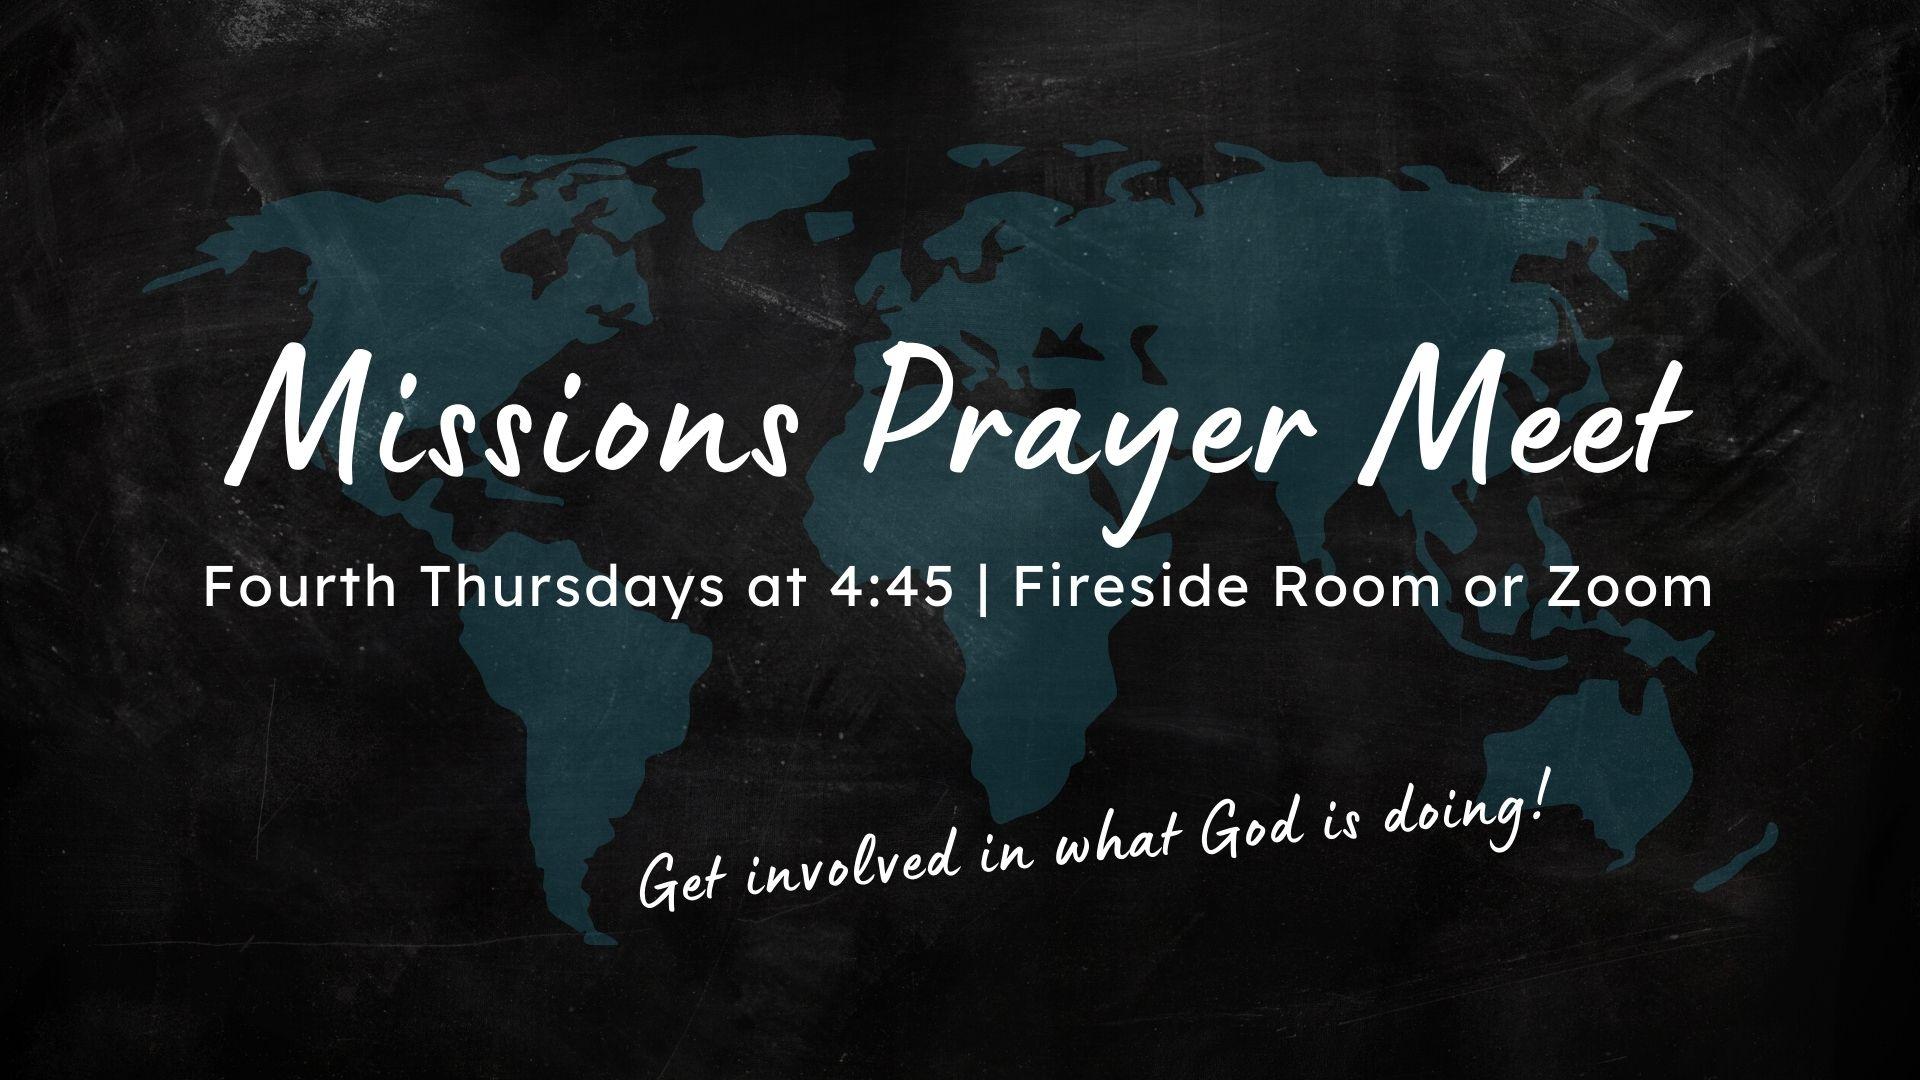 Missions Prayer Meet (6)